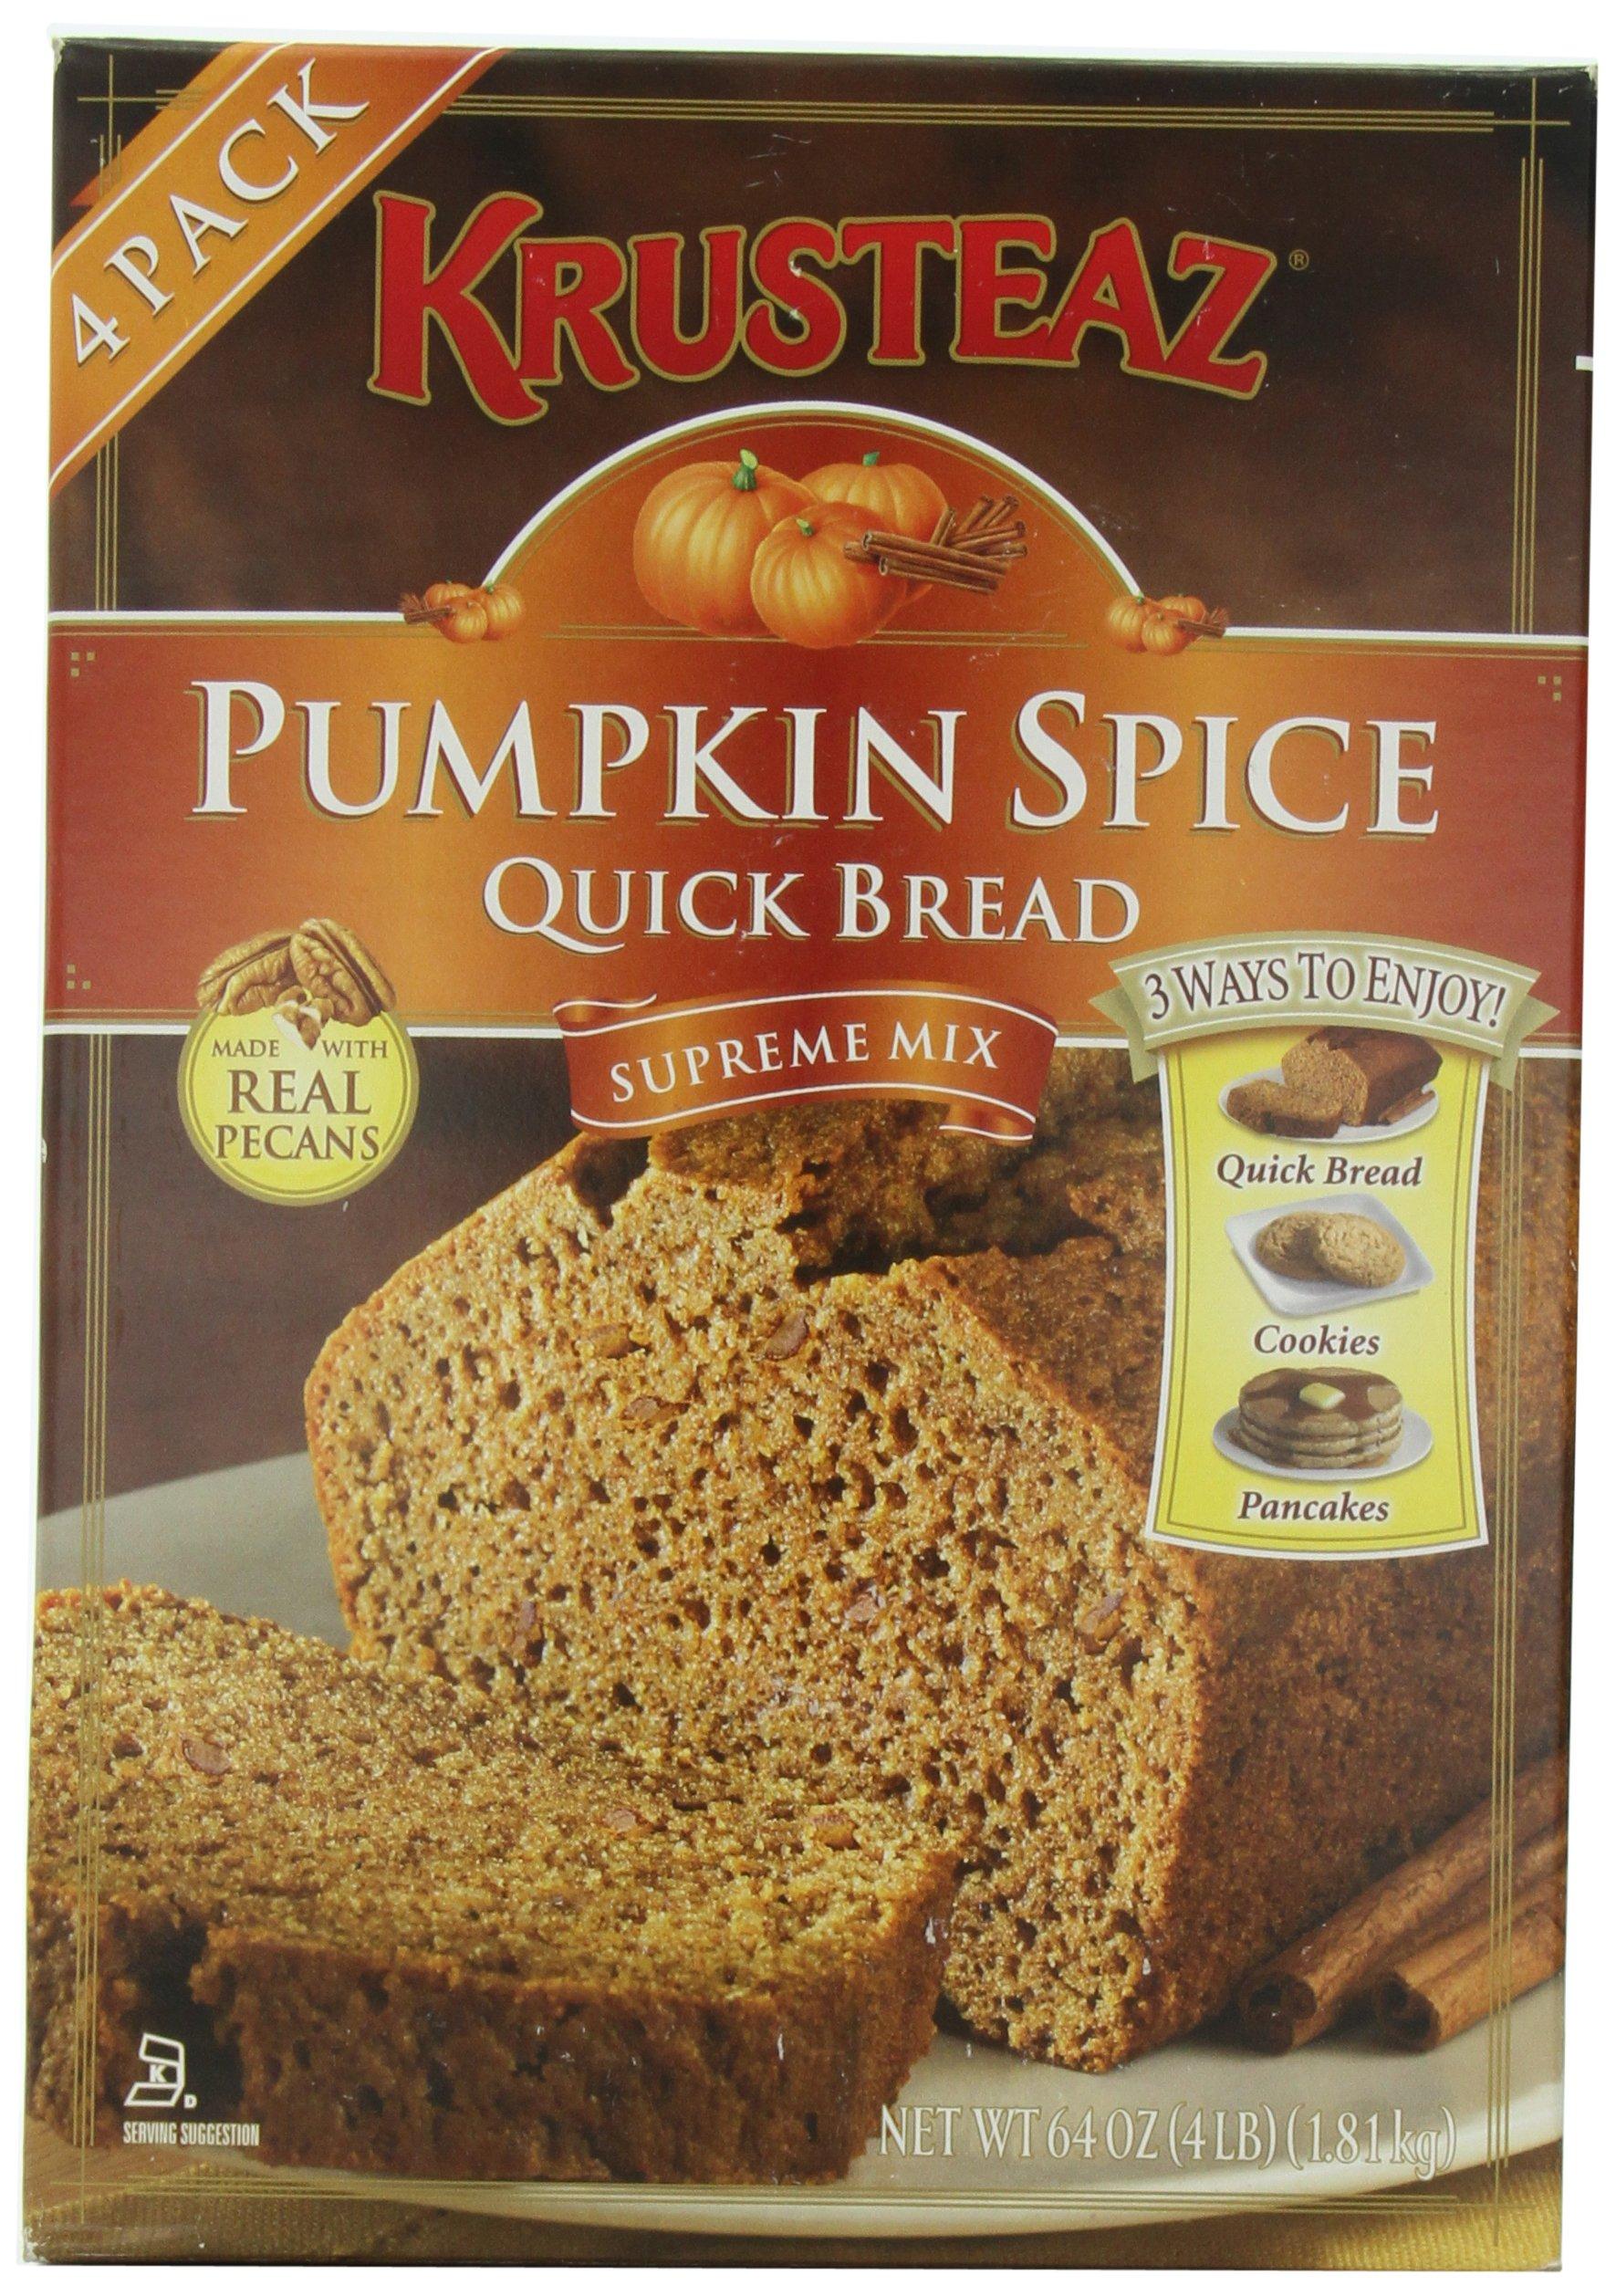 Pumpkin Spice Bread Quick Bread - Krusteaz Quick Bread Supreme Mix, NET WEIGHT 64 oz. (FOUR 1 lb MIX PACK)